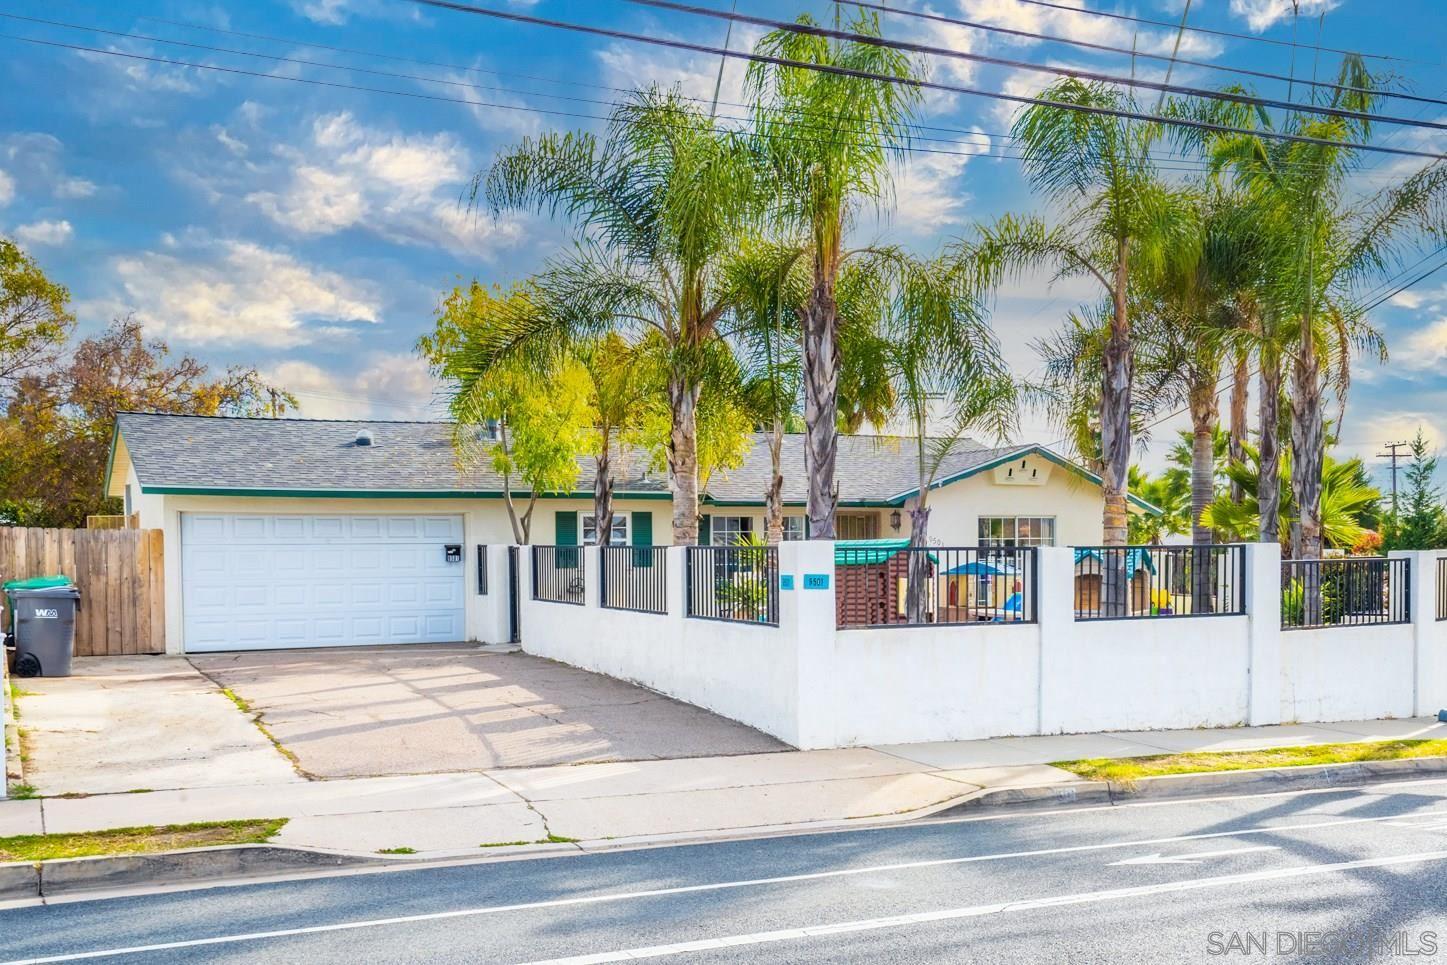 9501 Carlton Hills Blvd, Santee, CA 92071 - MLS#: 210000344